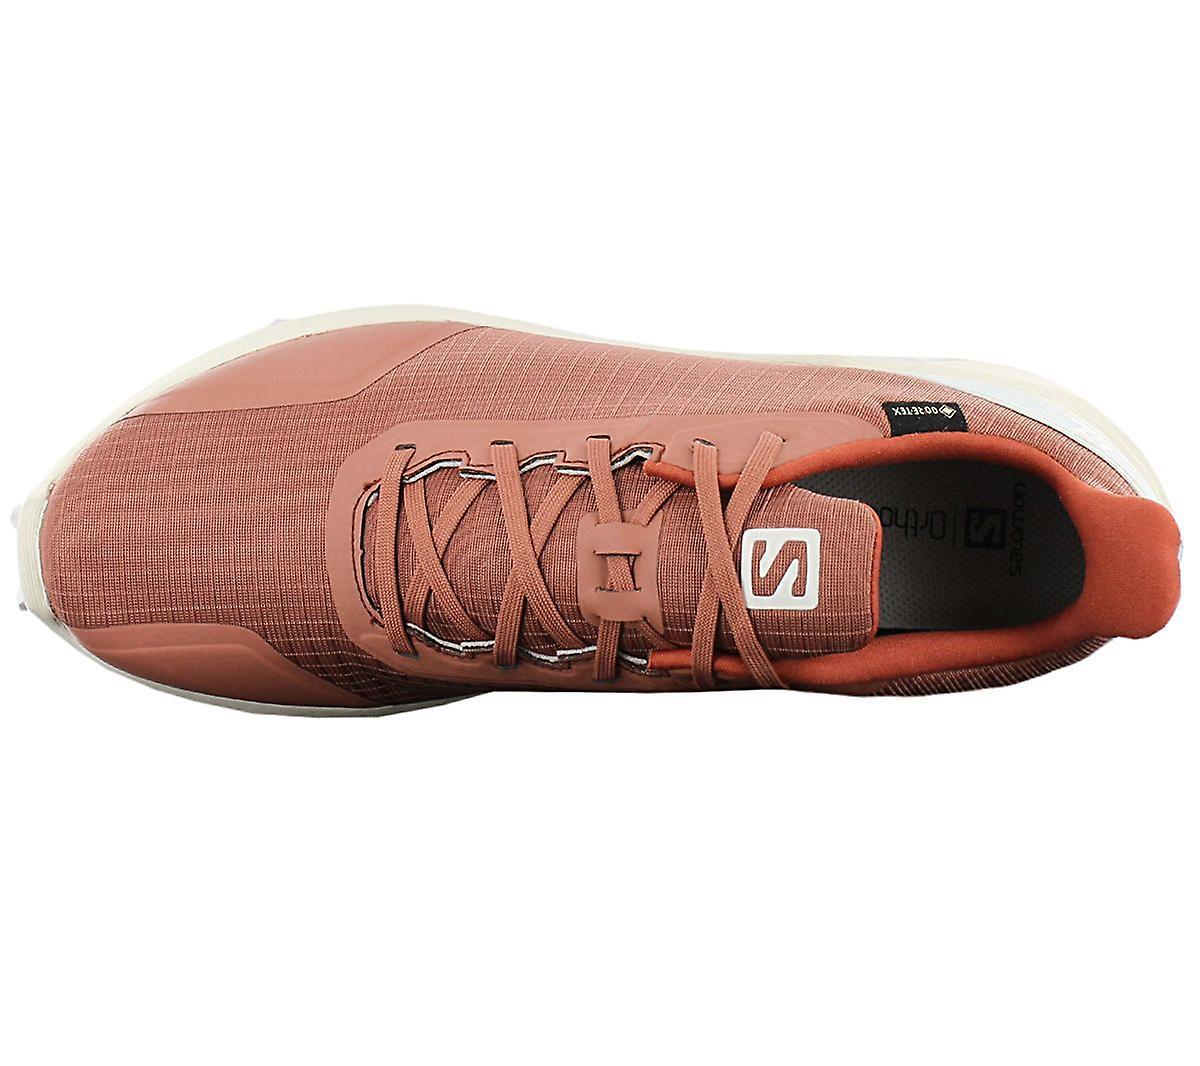 Salomon Alphacross Gtx - Gore-tex Herren Trail-running Schuhe Braun 409611 Sneakers Sportschuhe